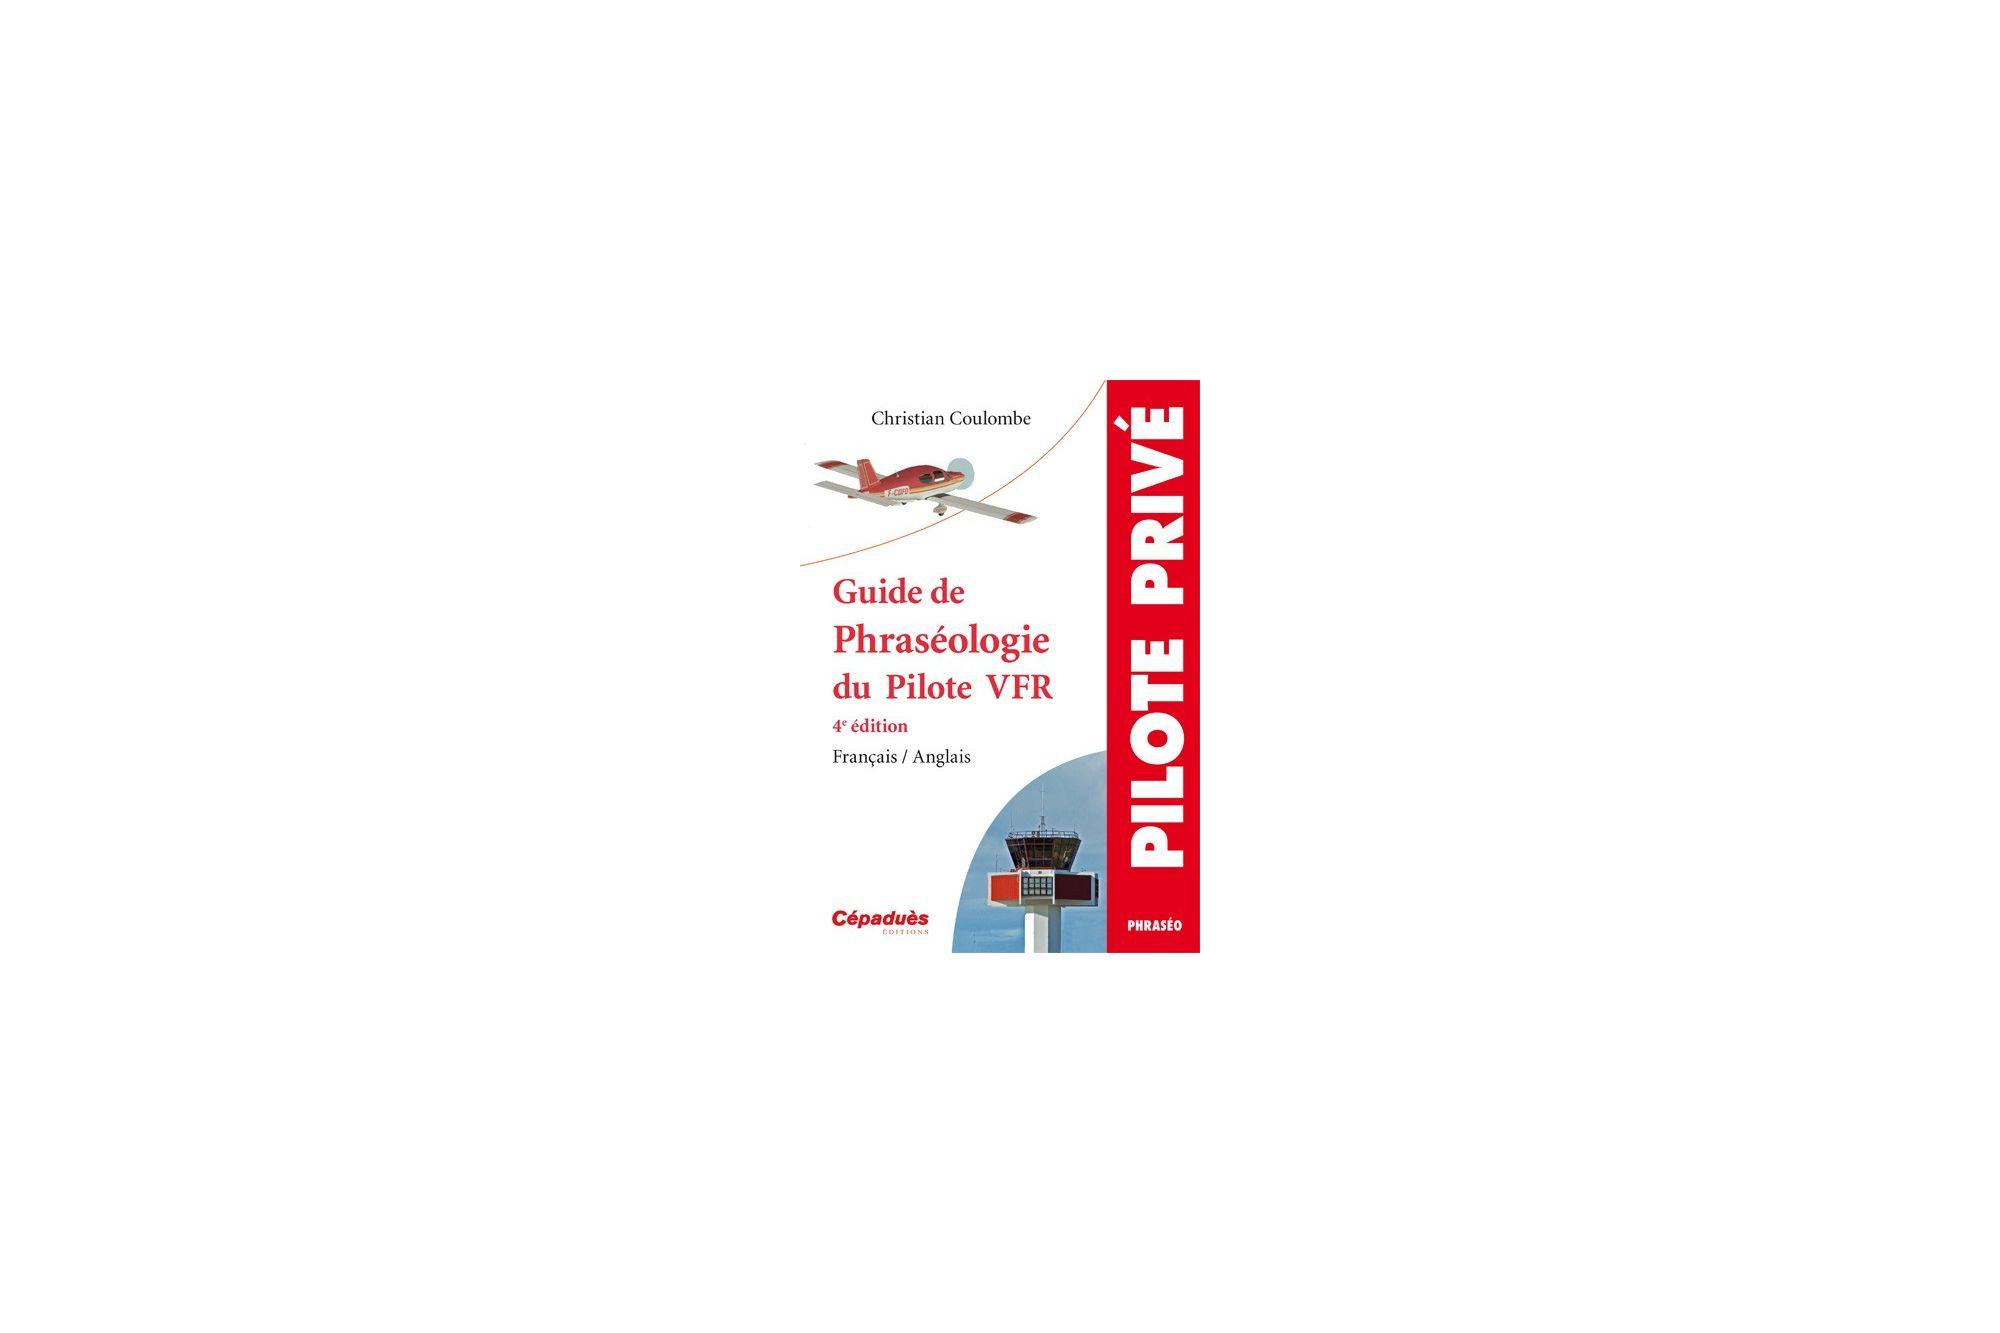 Phraséologie du Pilote VFR